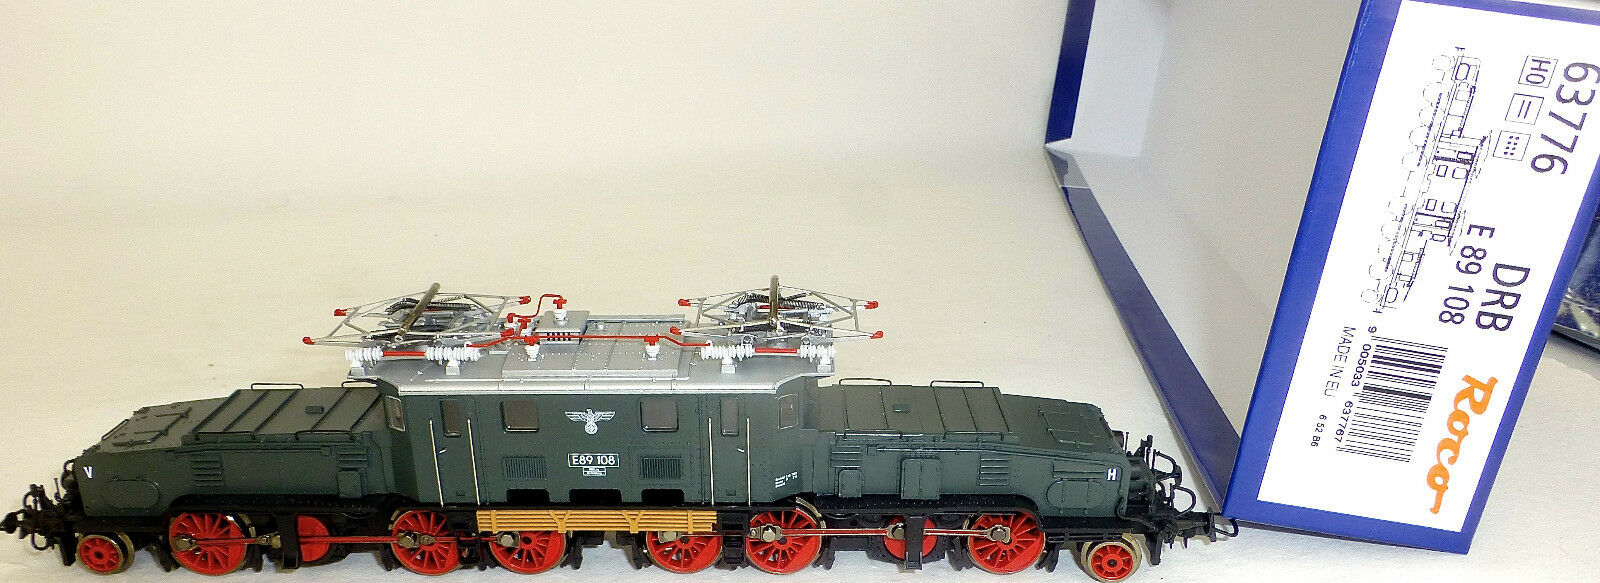 89 drb crocodilo e locomotora nem kkk dss roco 63776 h0 nach nuevo emb.orig.